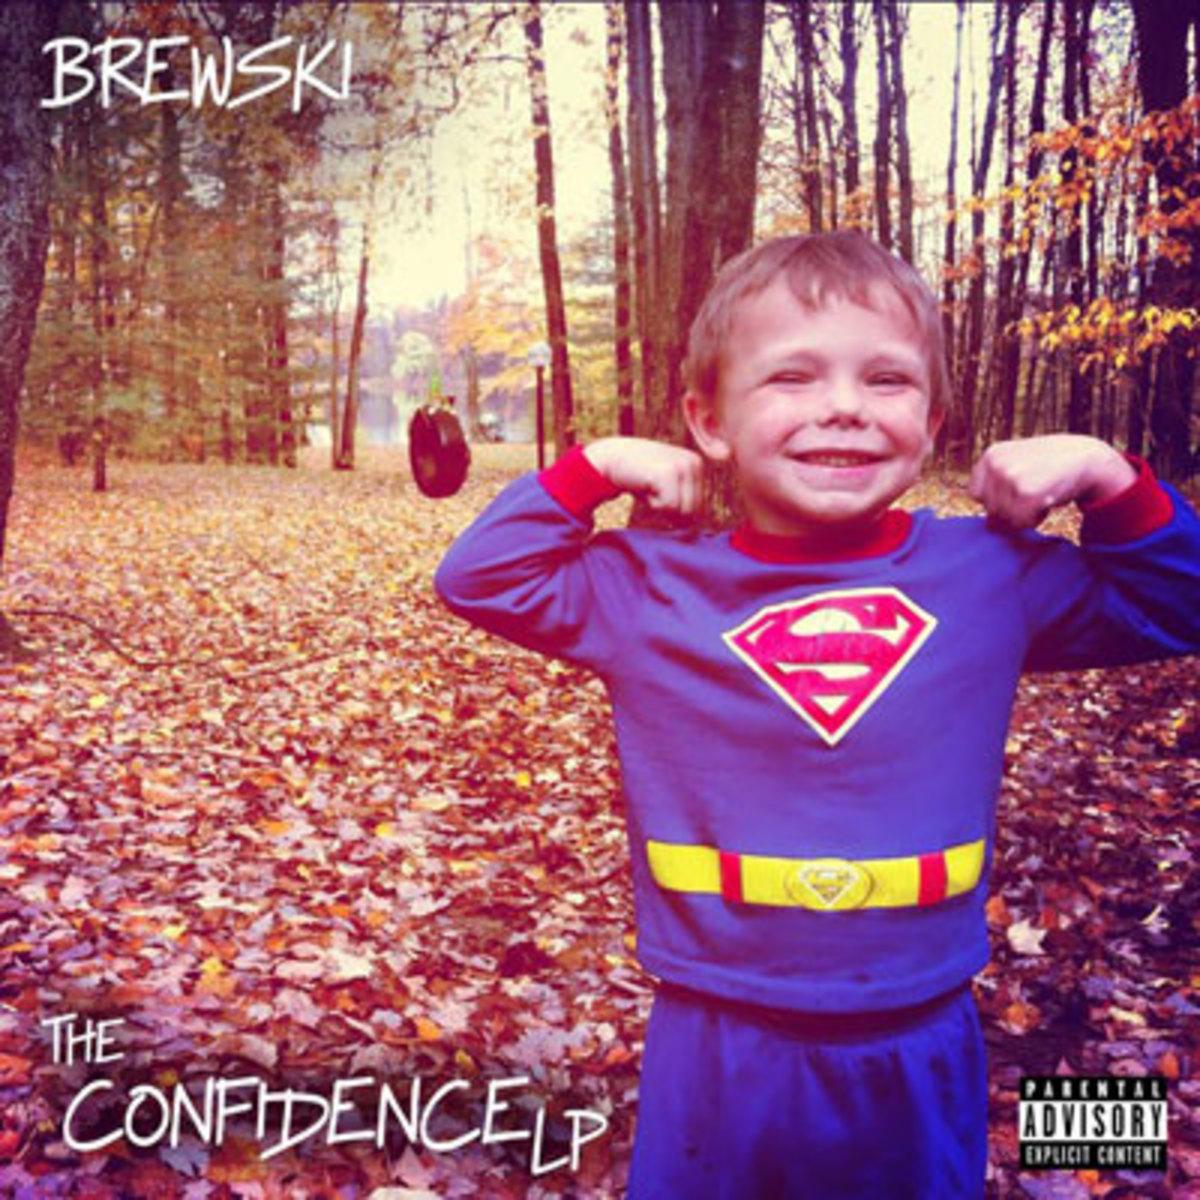 brewski-theconfidence-lp.jpg